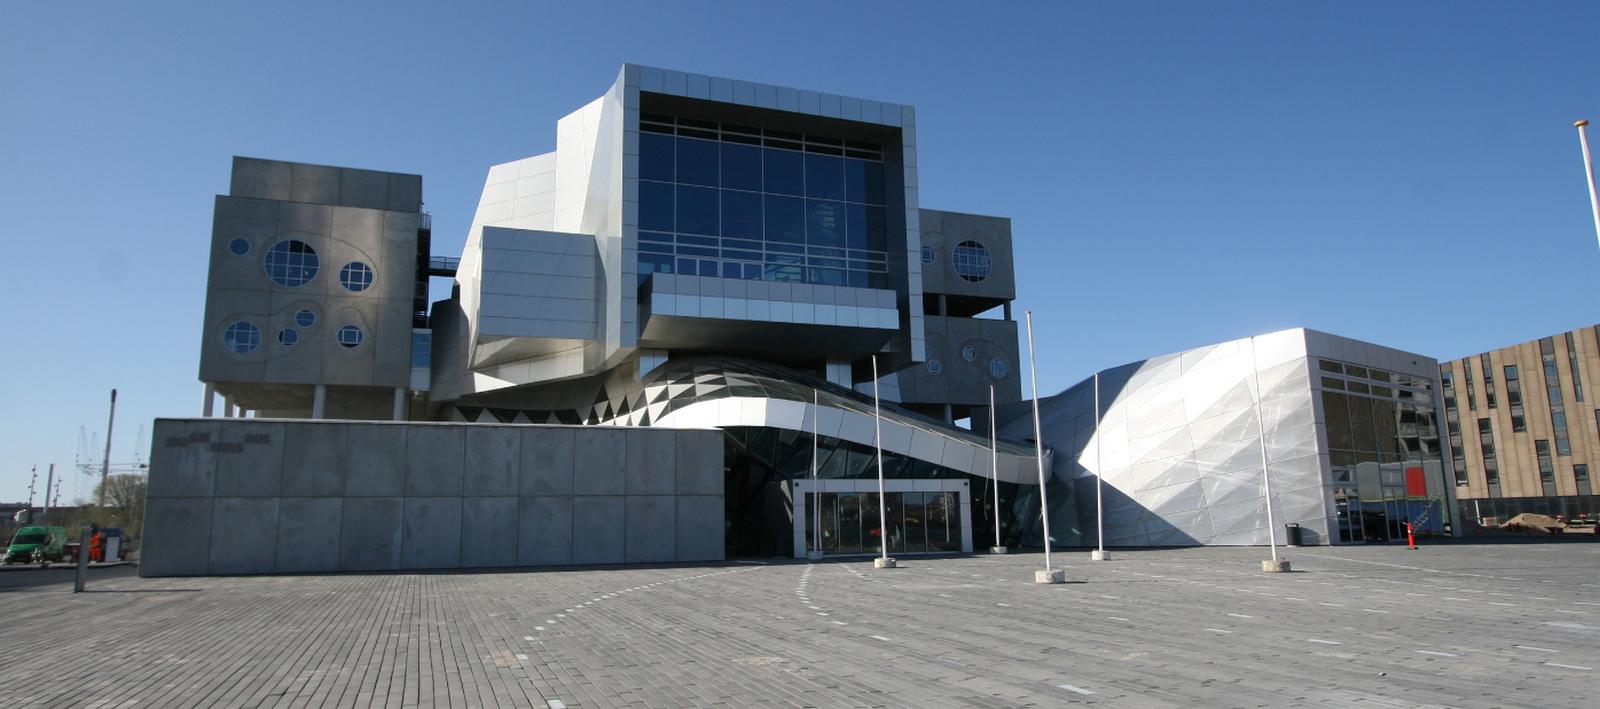 House of Music, Aalborg - Sheet1